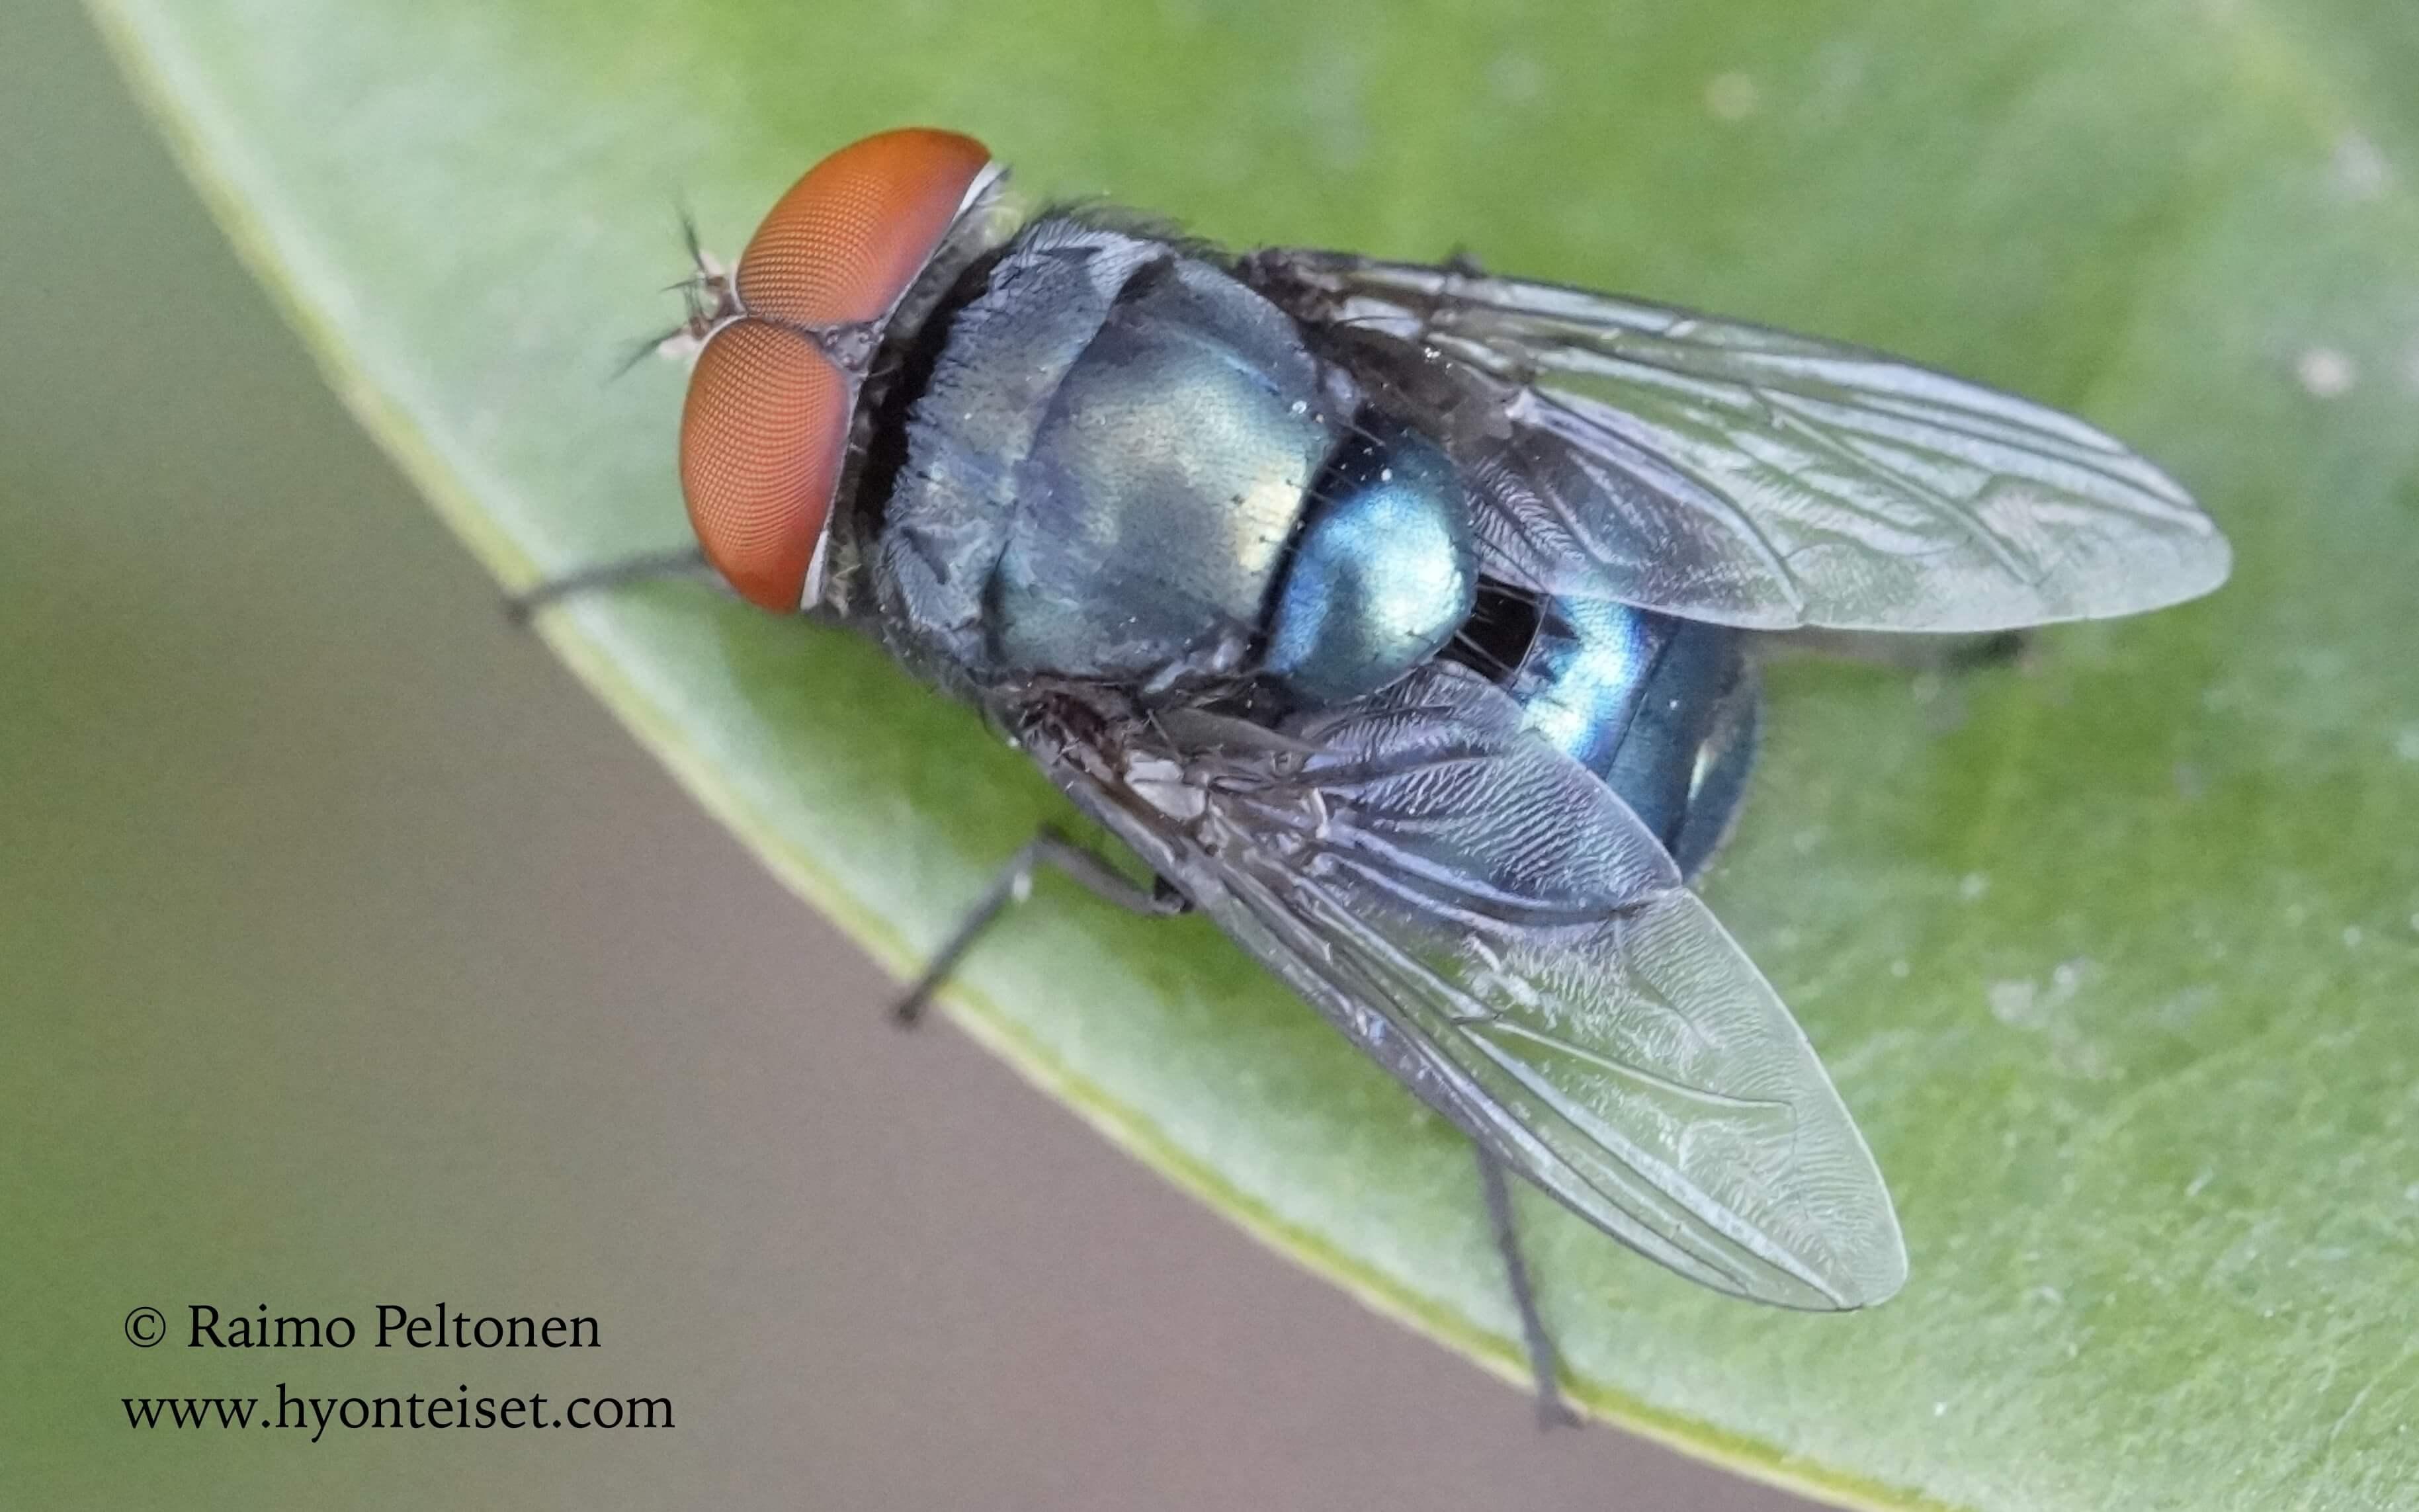 Chrysomyia megacephala (Calliphoridae) (det. Piluca Alvarez) GRAN CANARIA